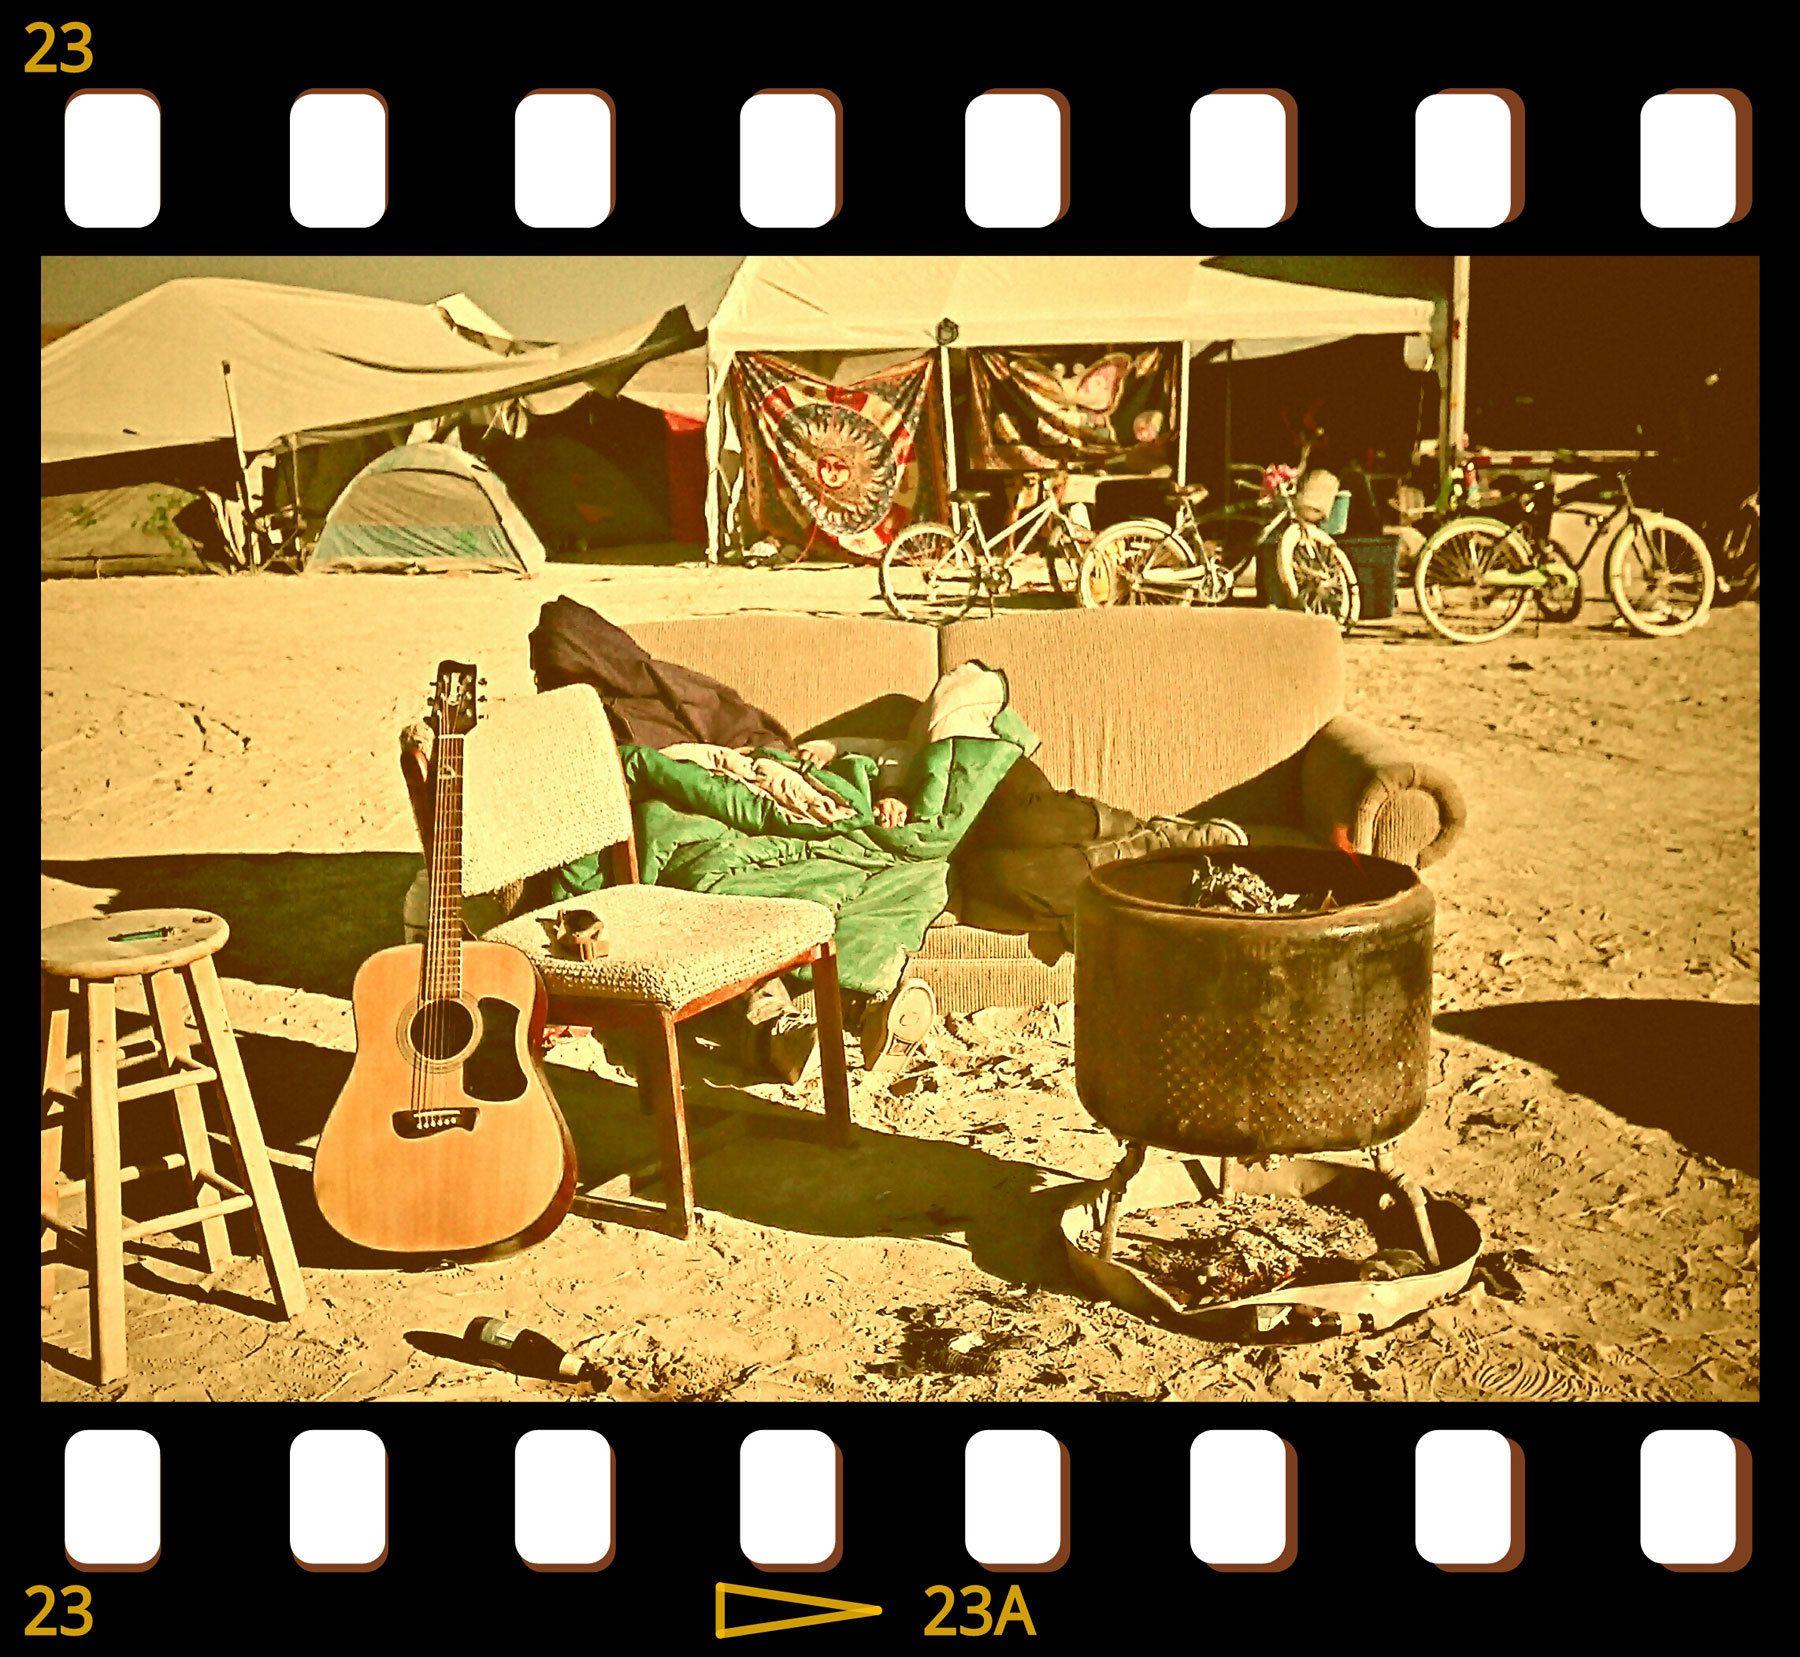 [Gypsy Flower Power Burning Man Camp, the last day... ]